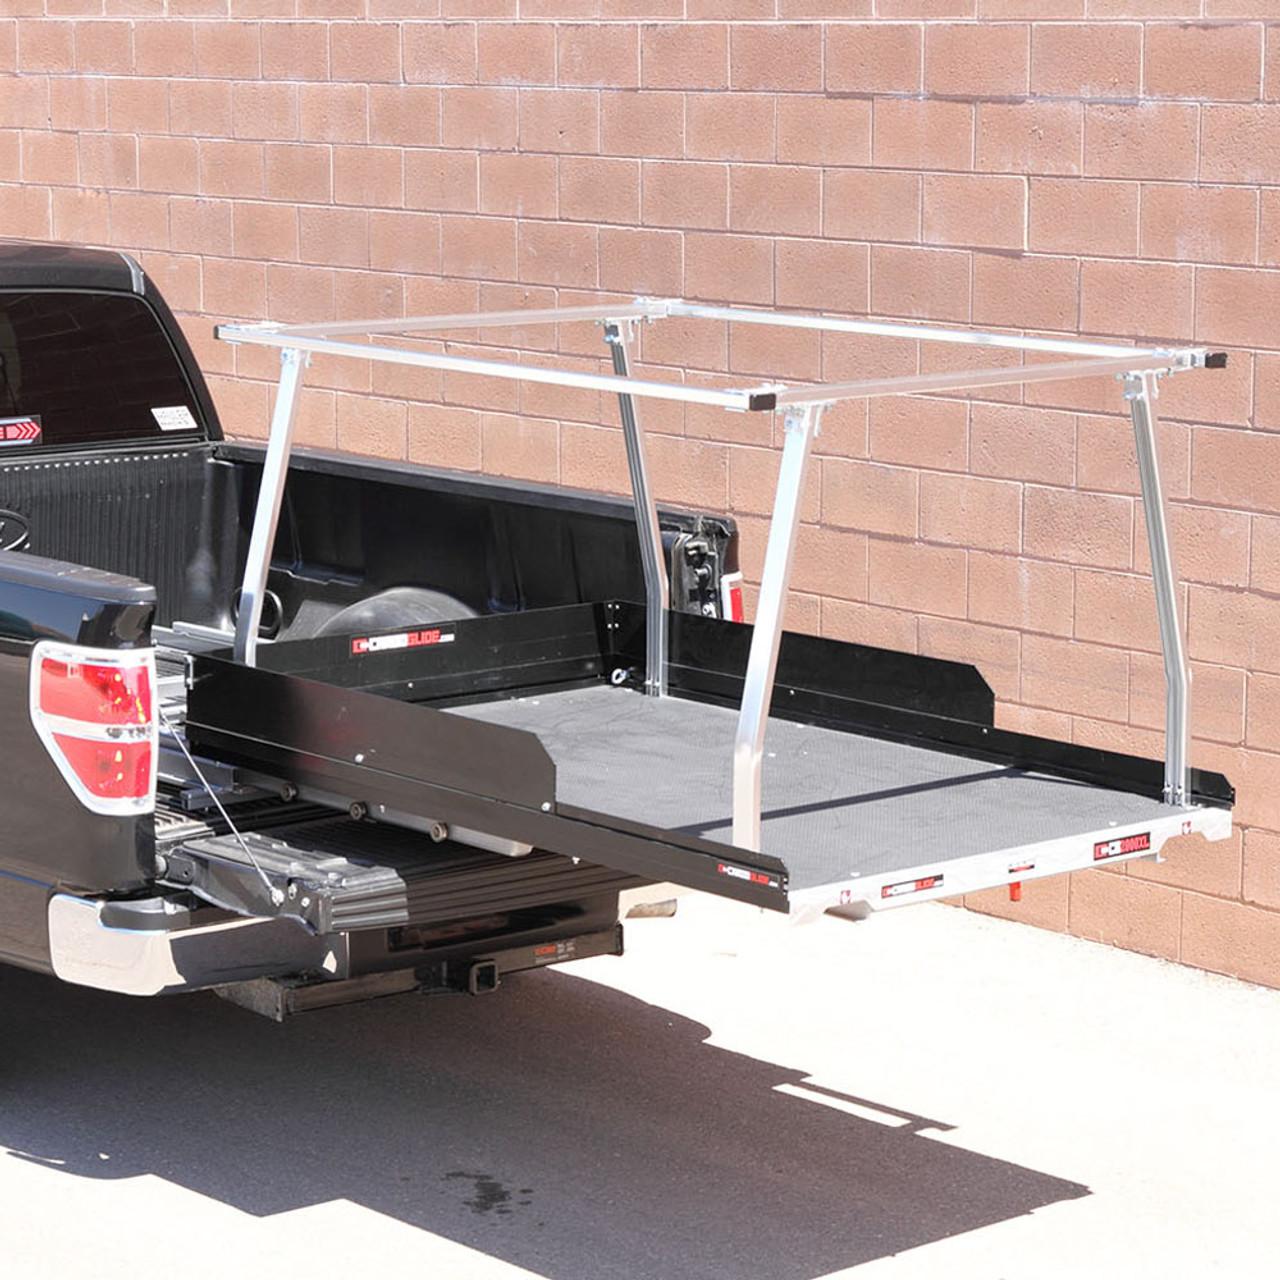 "Cargo-Glide CGCR CargoRack Aluminum Modular Rack System, choose 65"", 75"" or 95"" Slide"